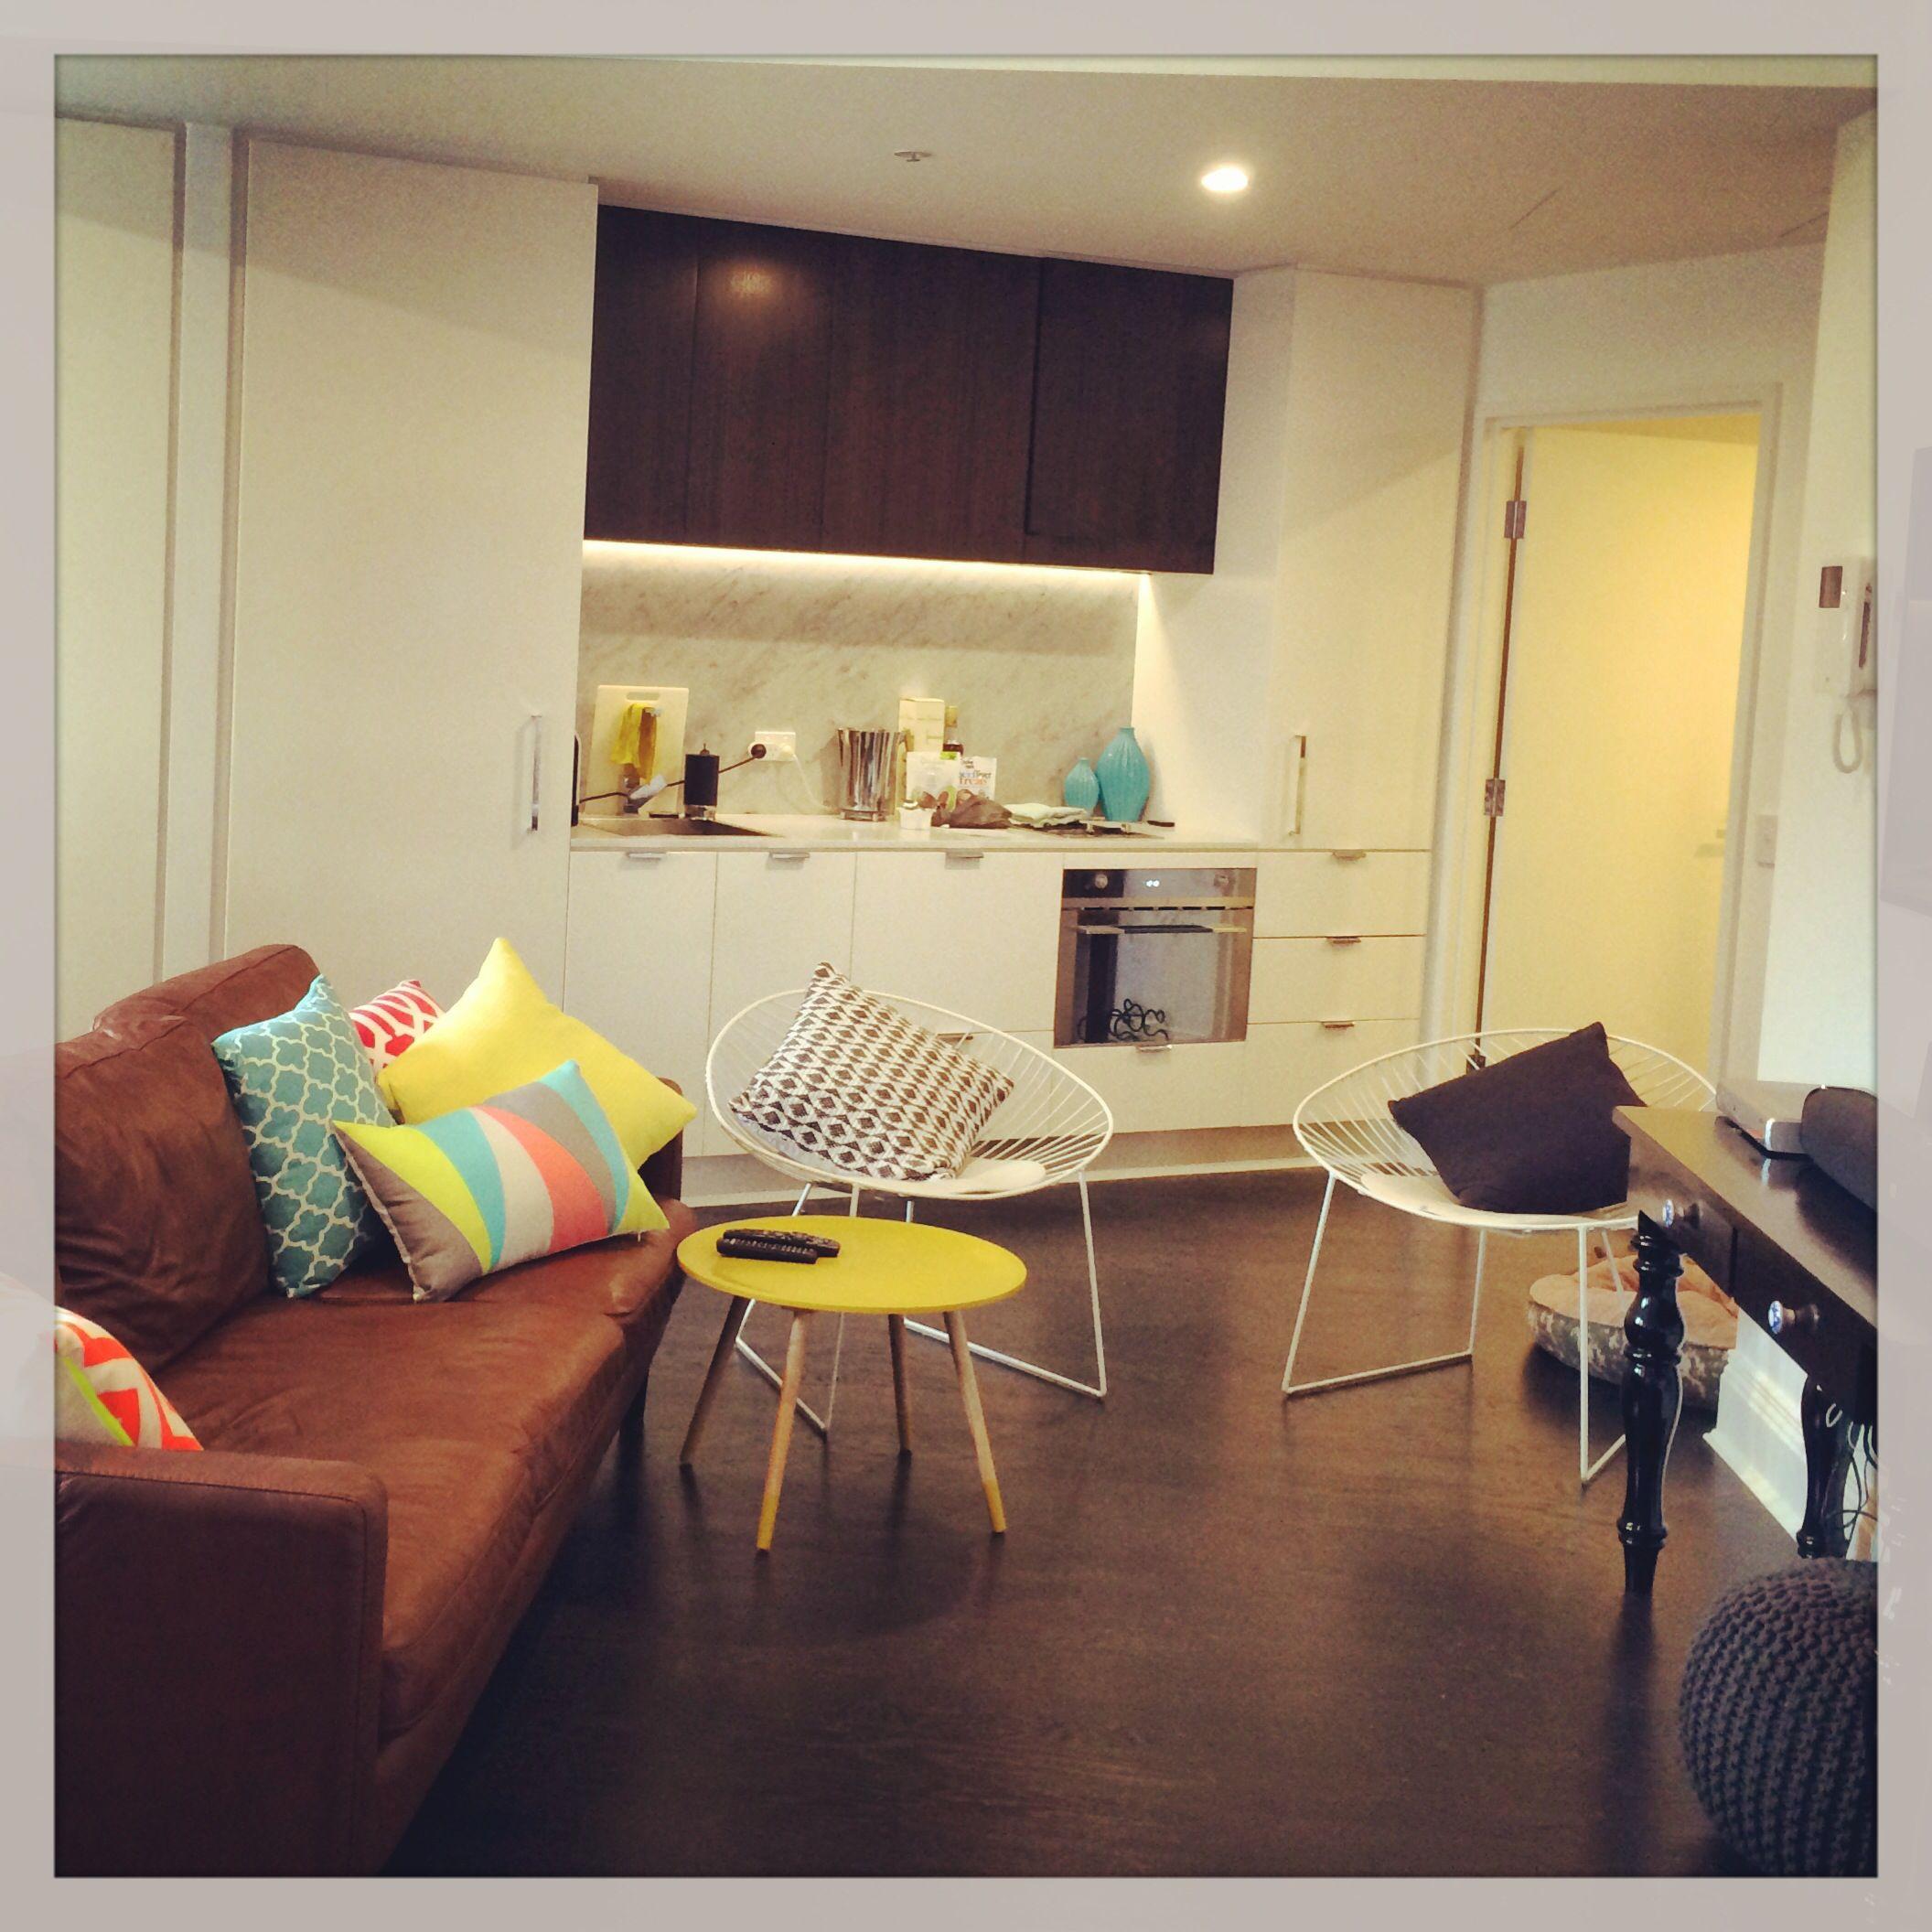 My studio apartment in Potts Point. Interior design die hard!